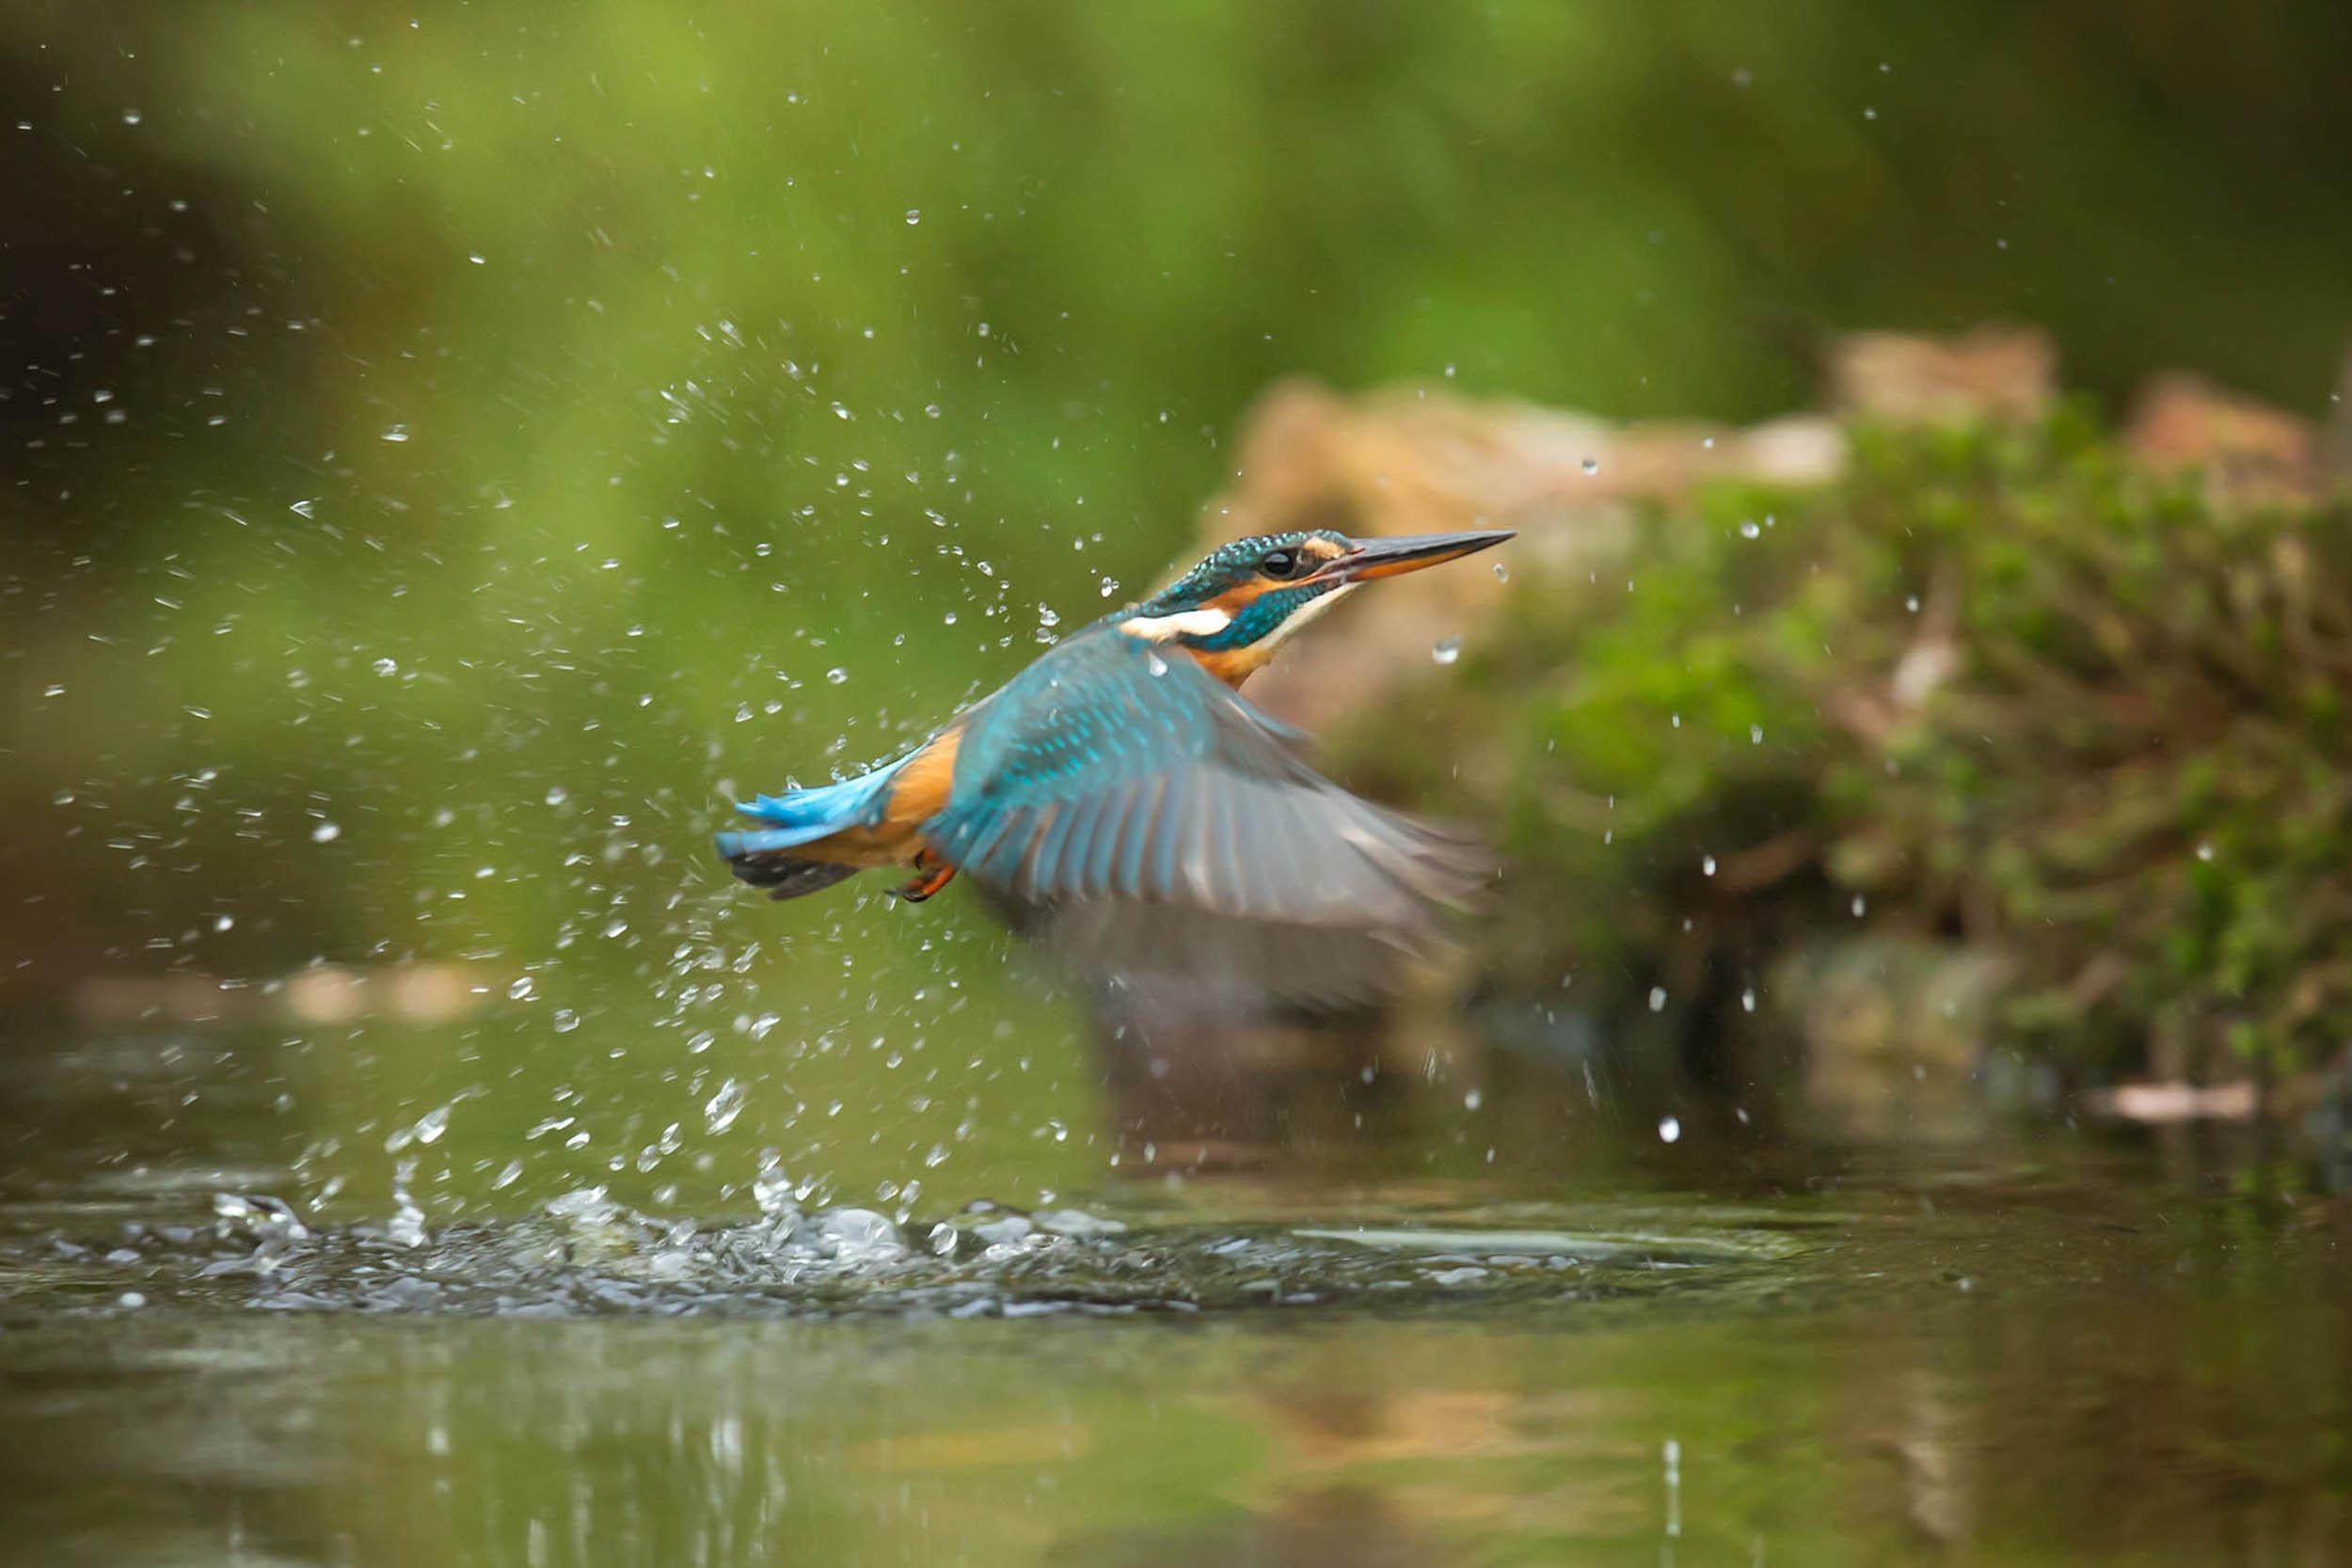 Vogel burstmode basics photography Photographing animals in the wild